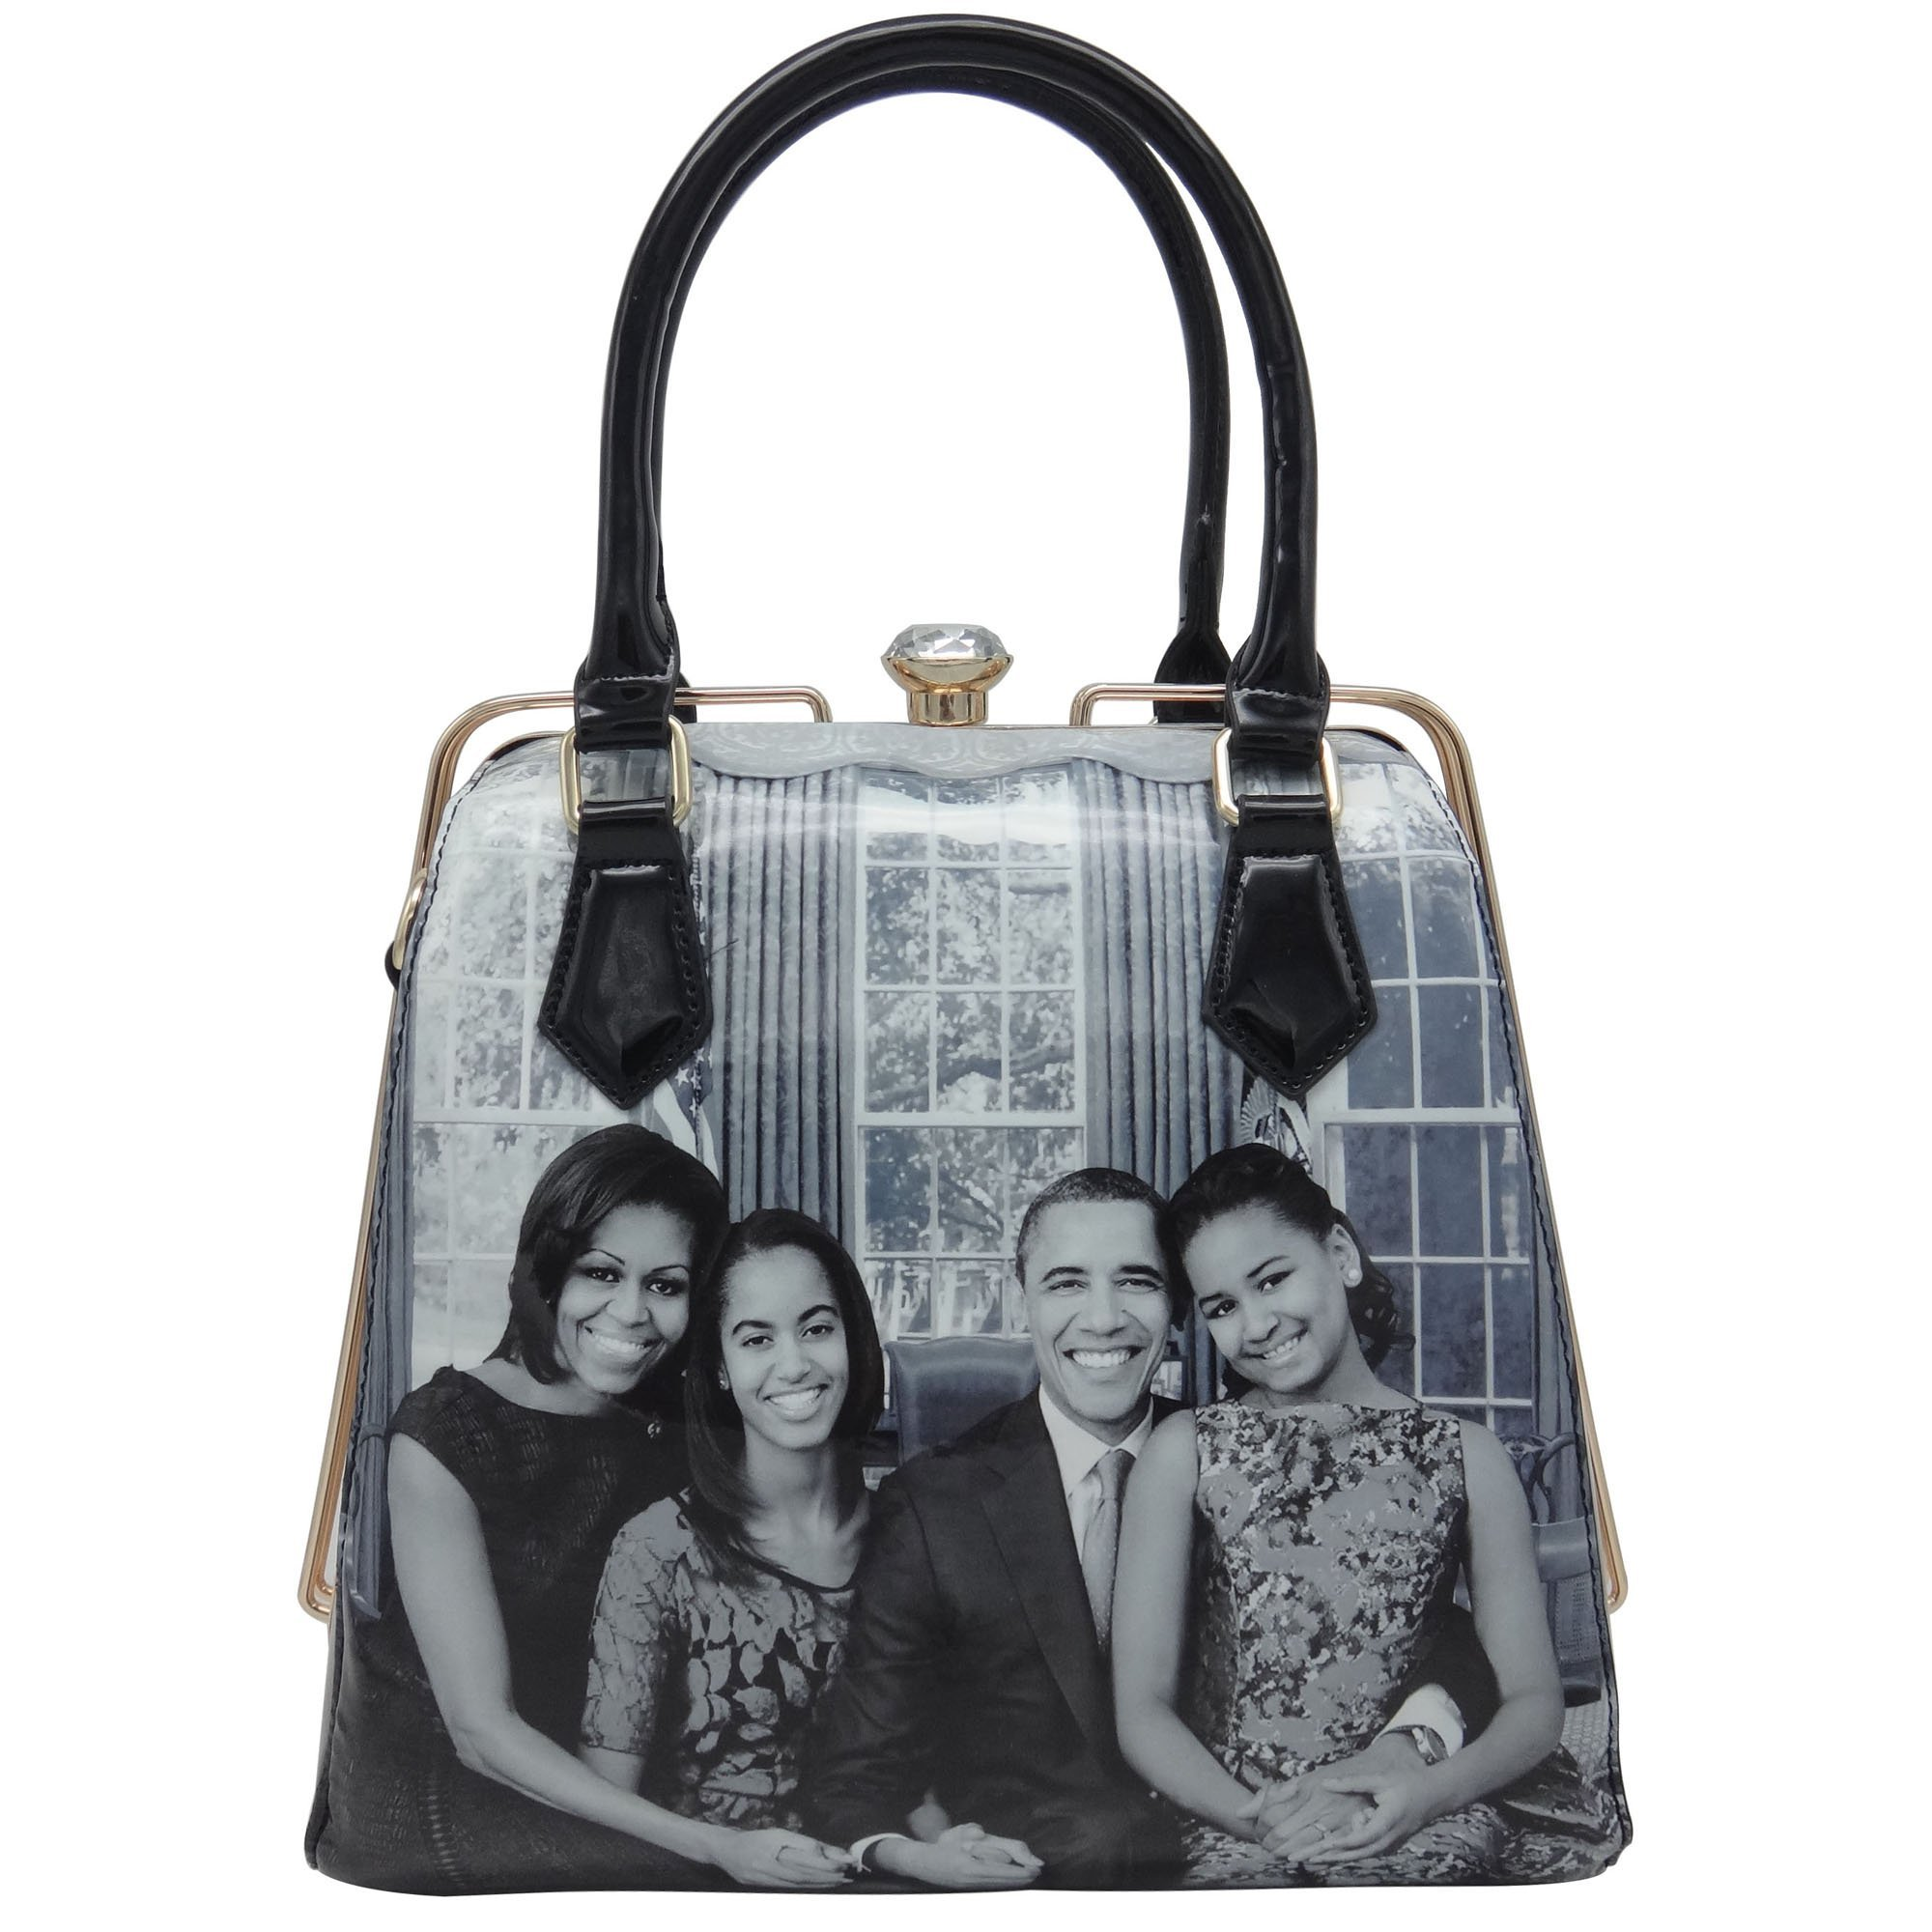 Michelle Obama Family Style Diamond Topped Tote